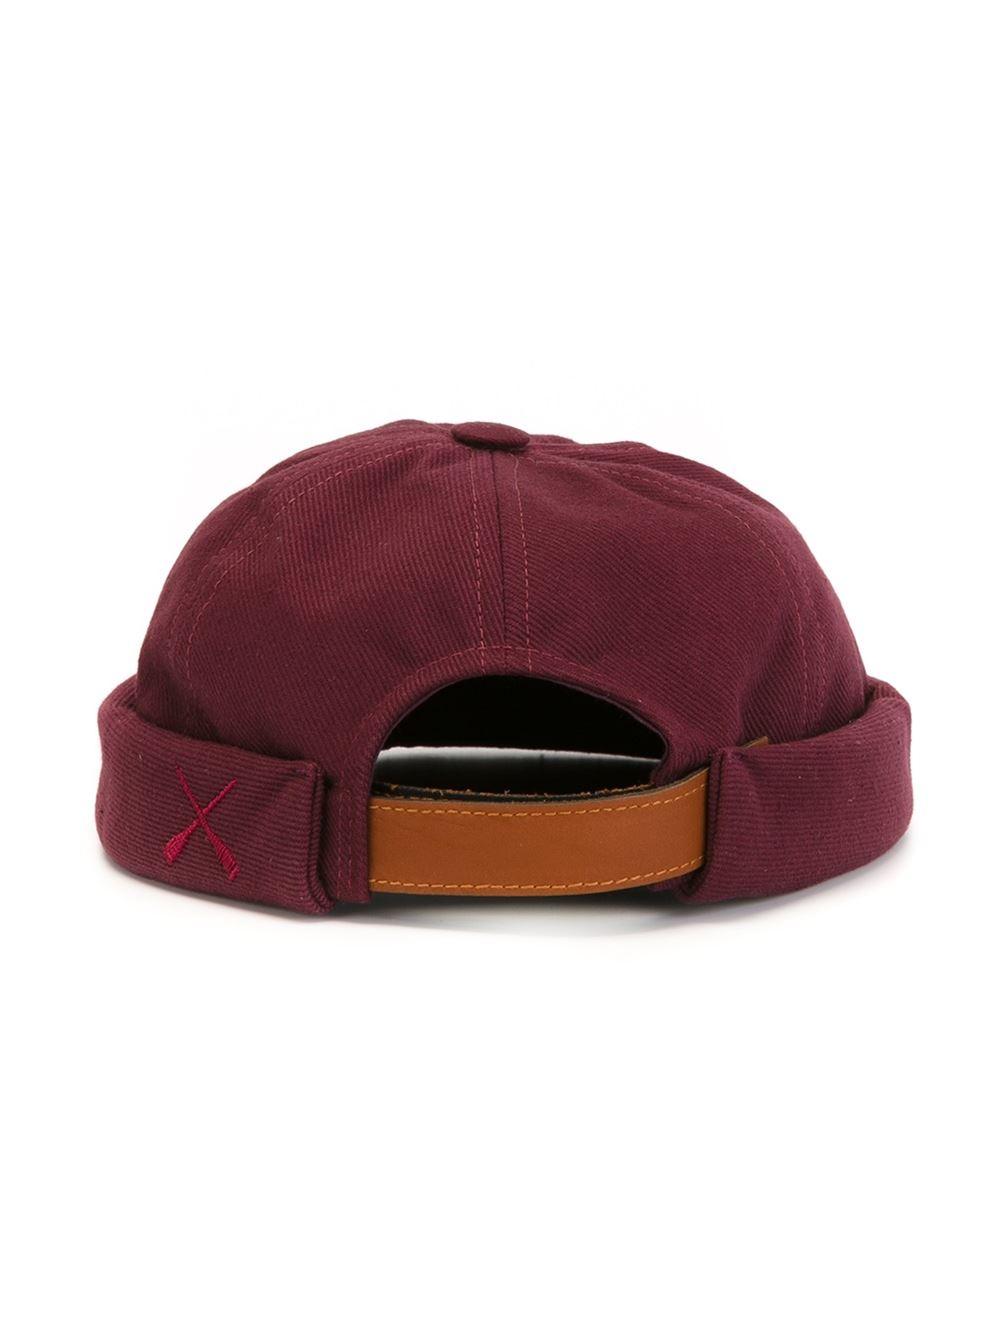 lyst beton cire billess hat in purple for men. Black Bedroom Furniture Sets. Home Design Ideas